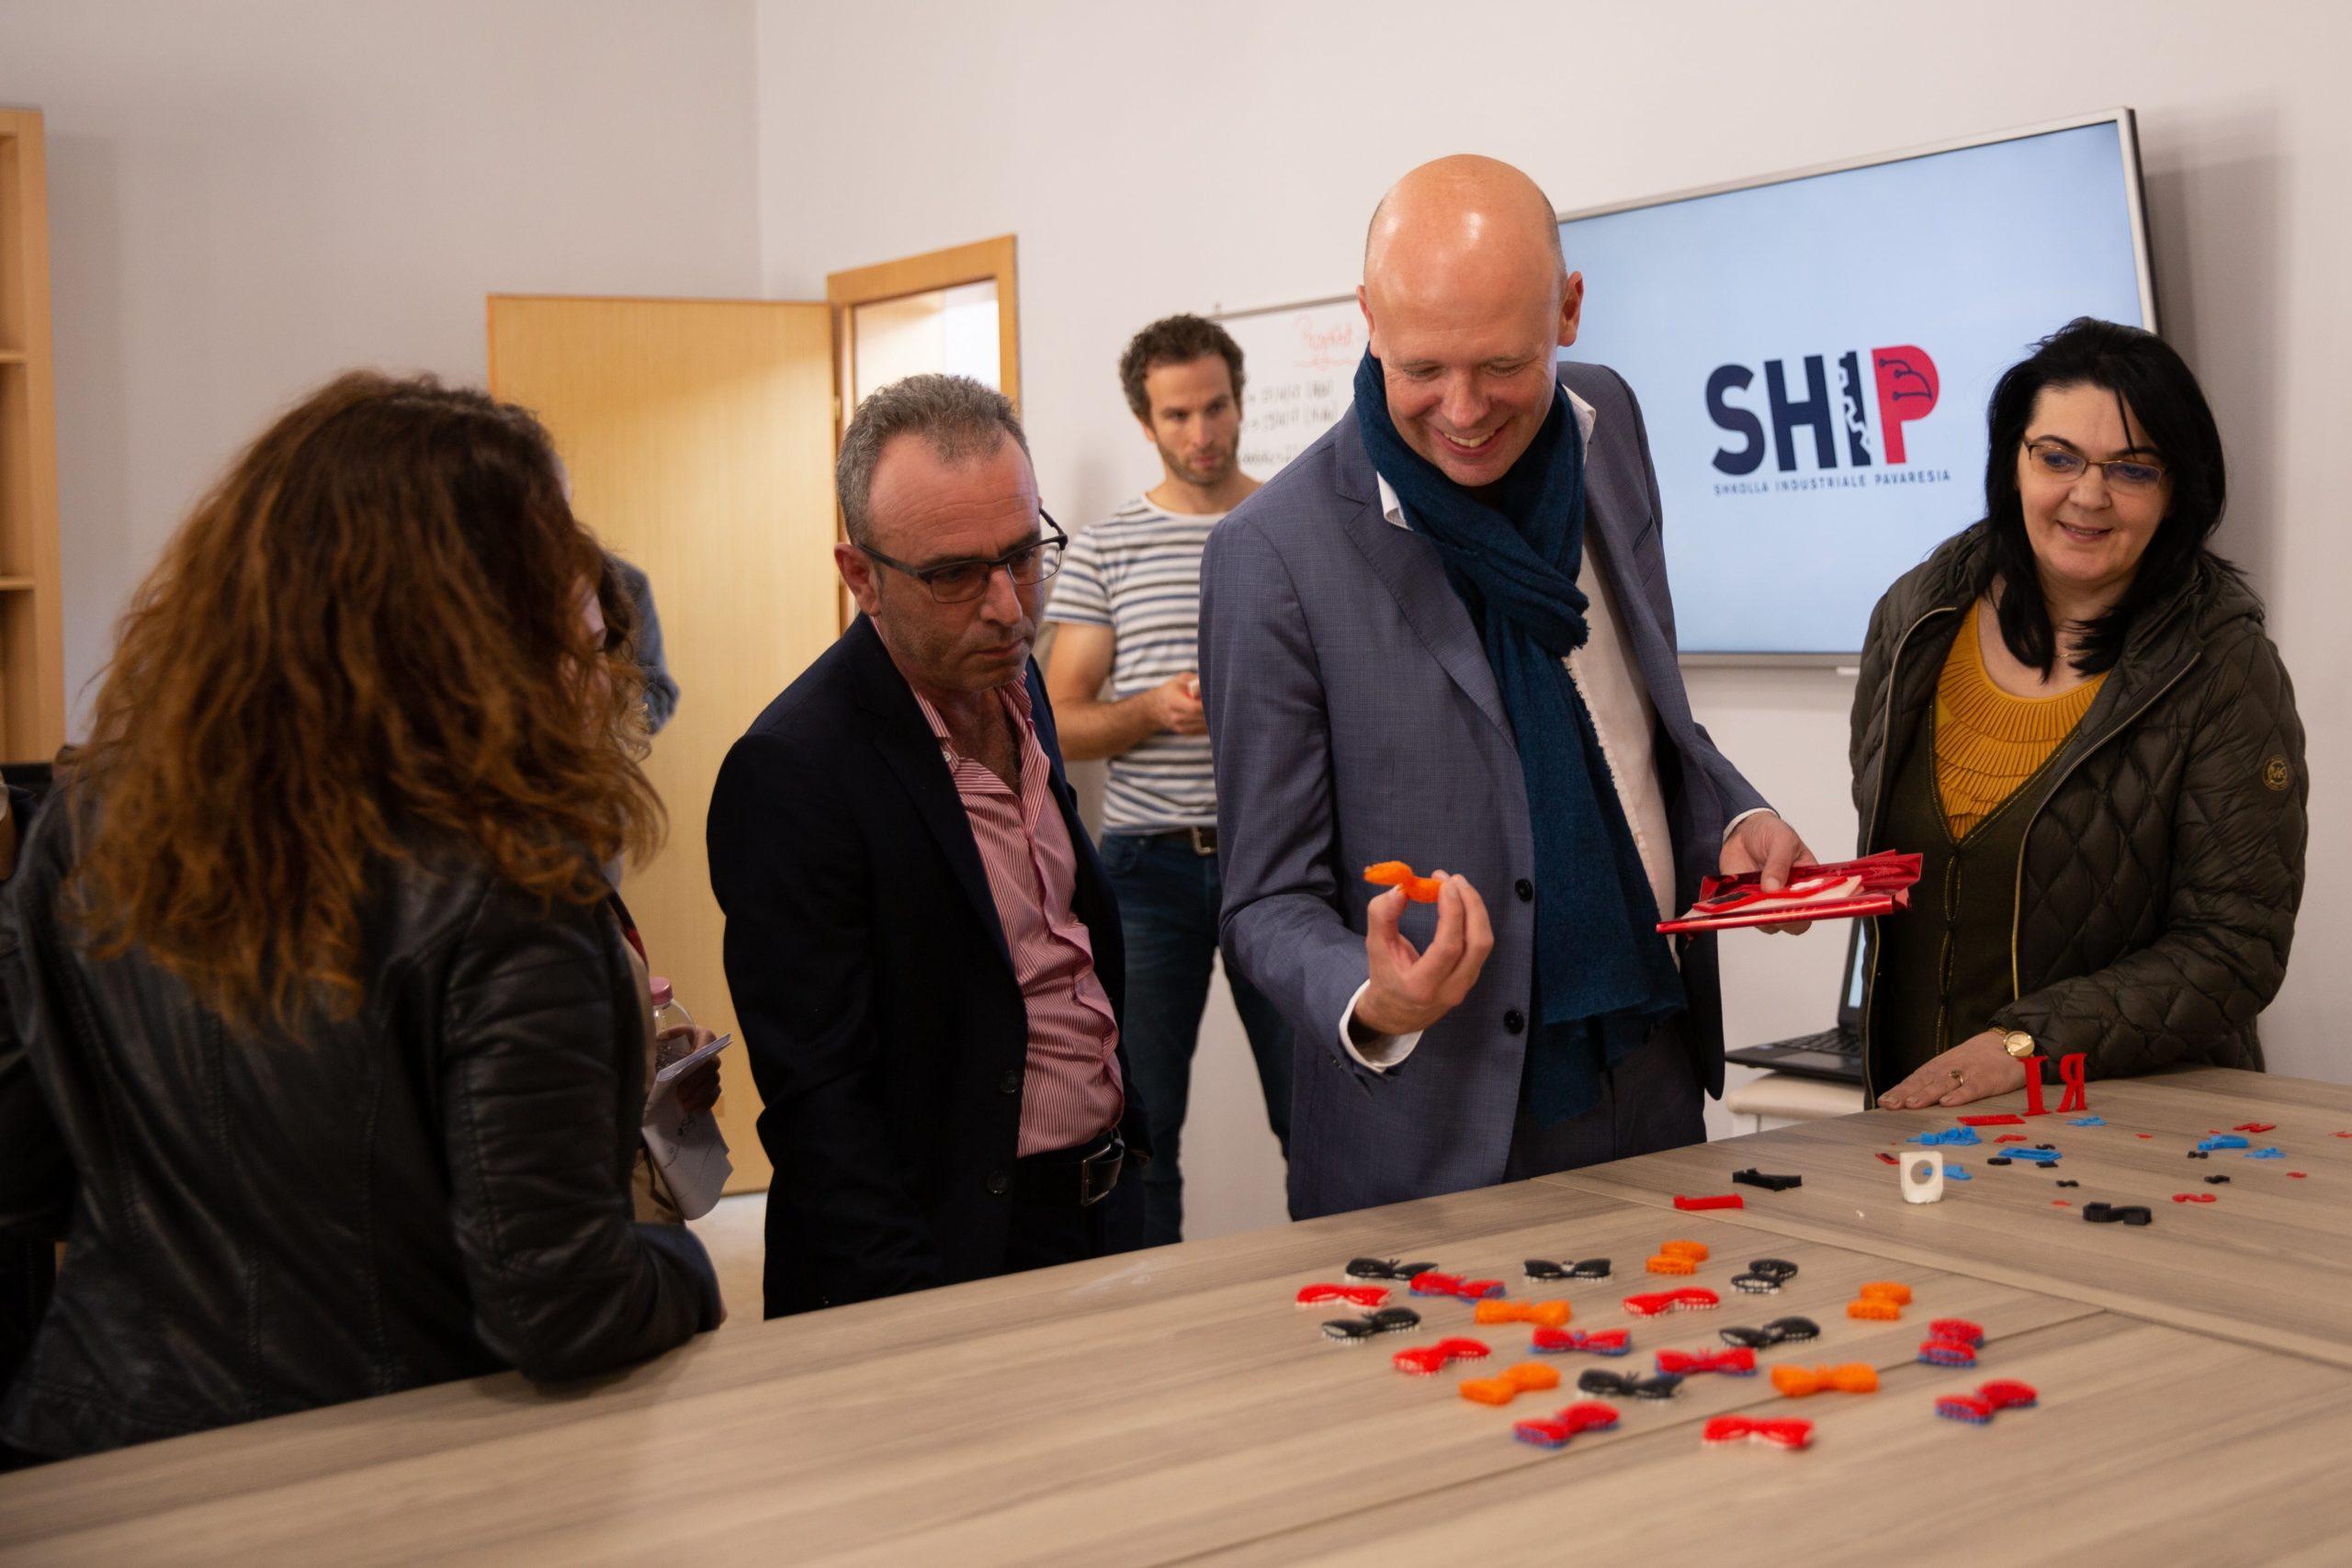 SHIP HOSTS THE VISIT OF TEACHERS FROM SWISS SCHOOL IDM